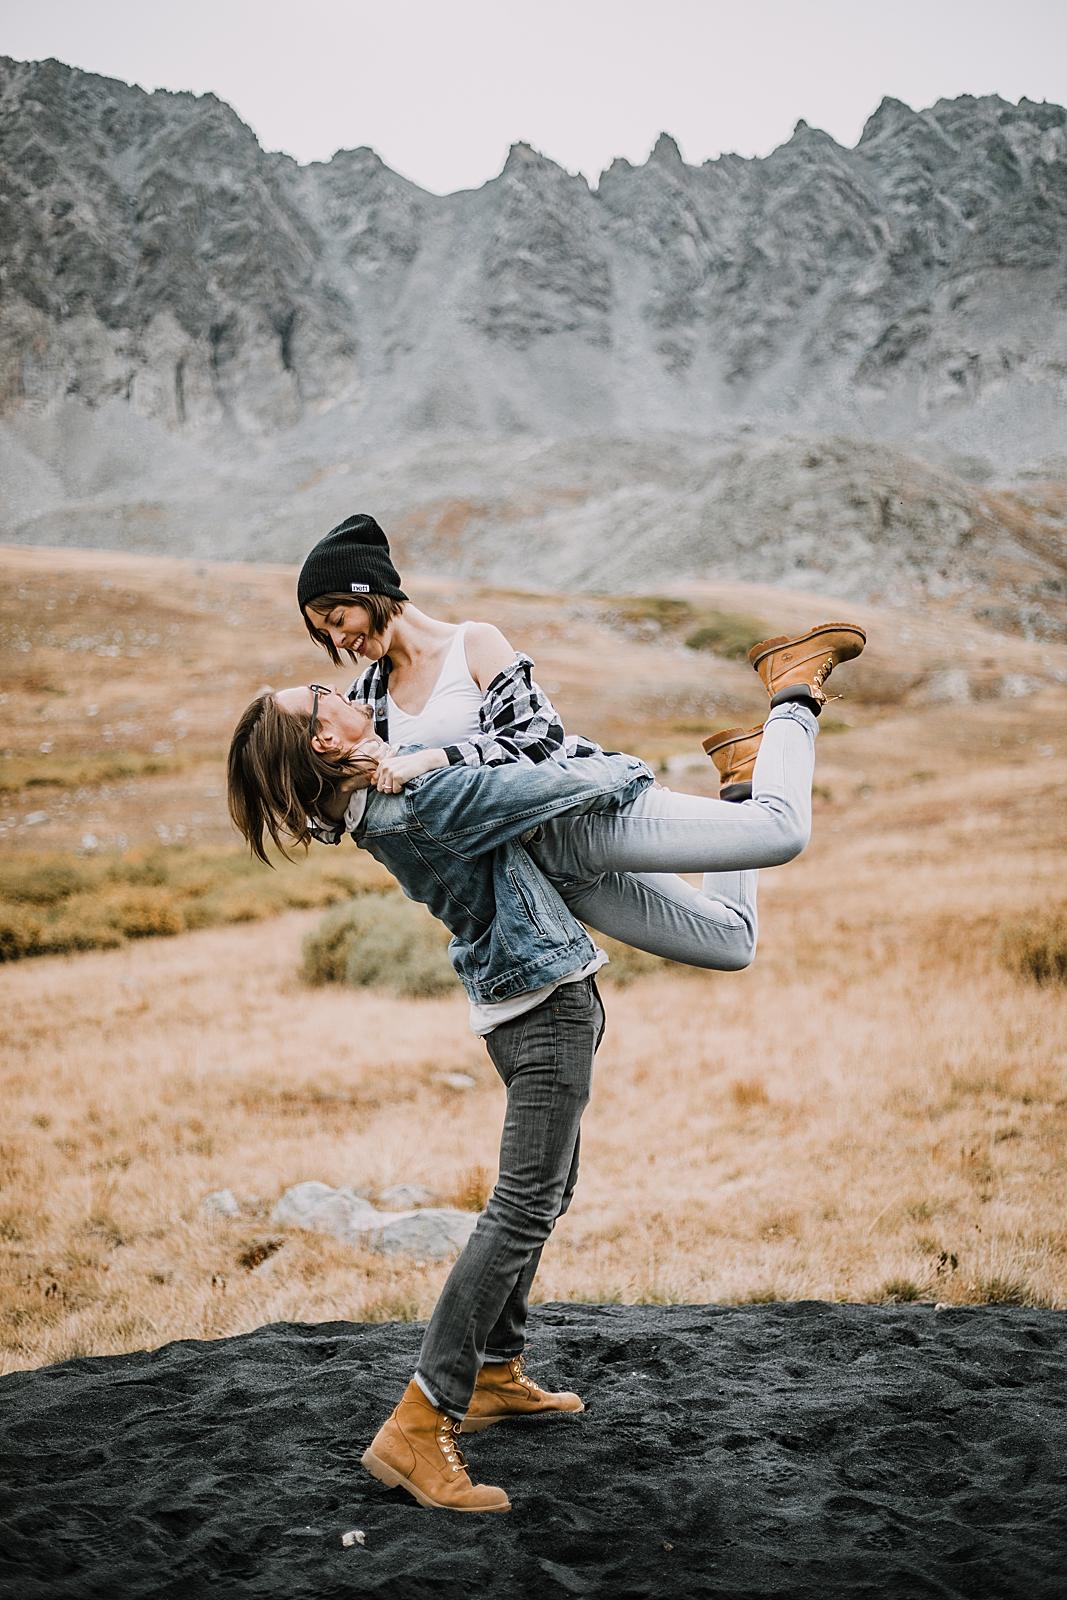 couple swing dancing, colorado surprise proposal, hike mayflower gulch, mayflower gulch proposal, mayflower gulch elopement, mayflower gulch wedding, colorado 14er, leadville elopement